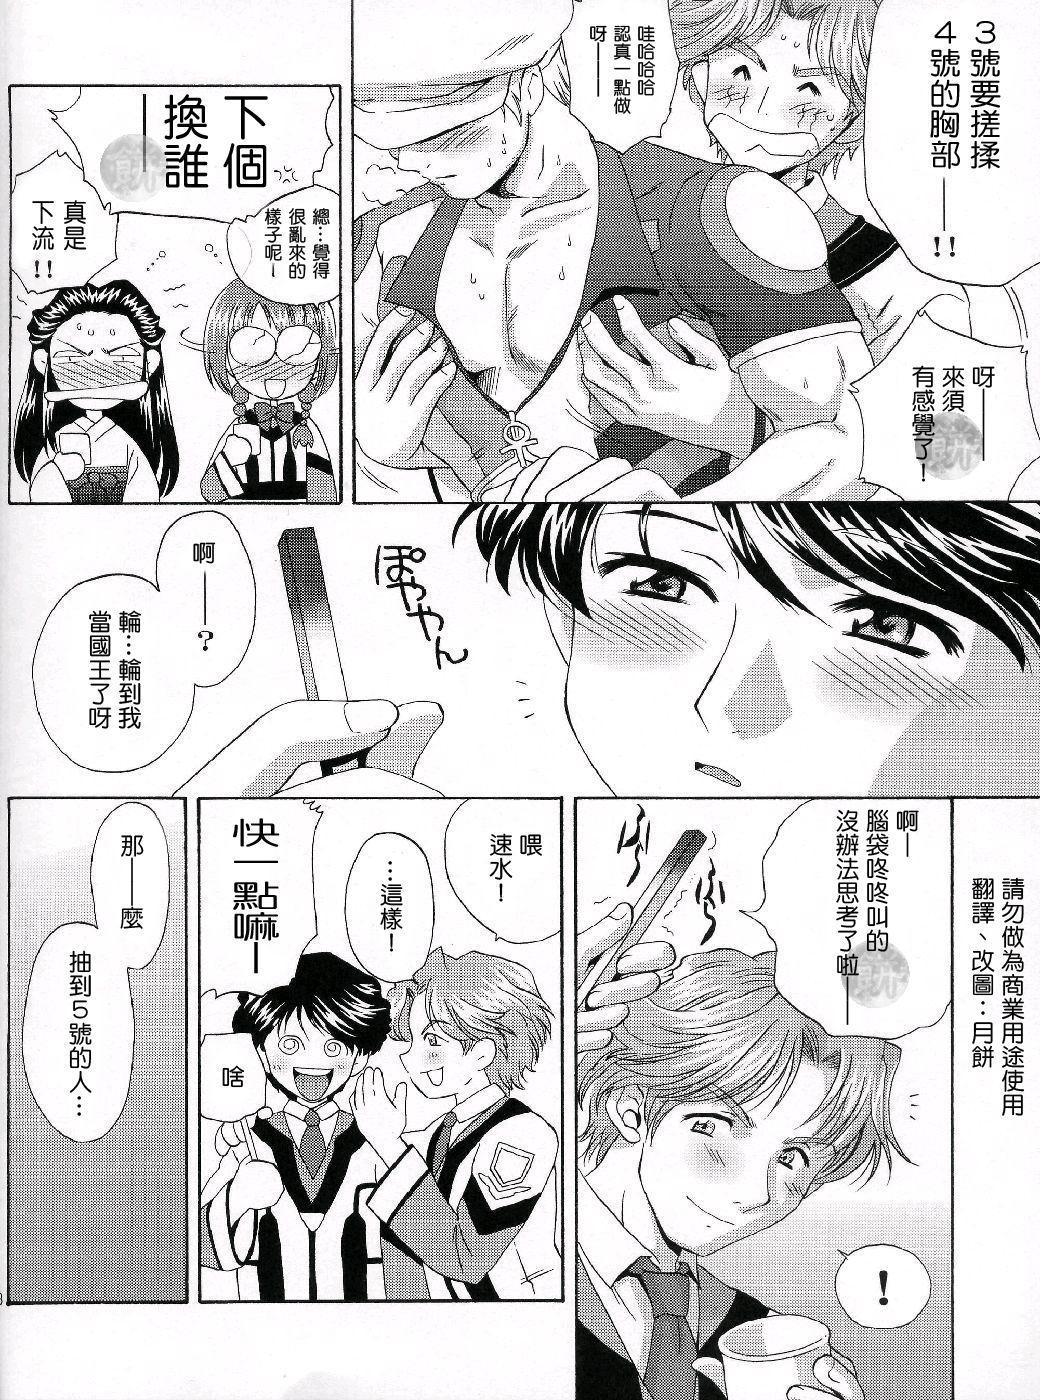 Hakudakueki Gensou Gang Bang March 6